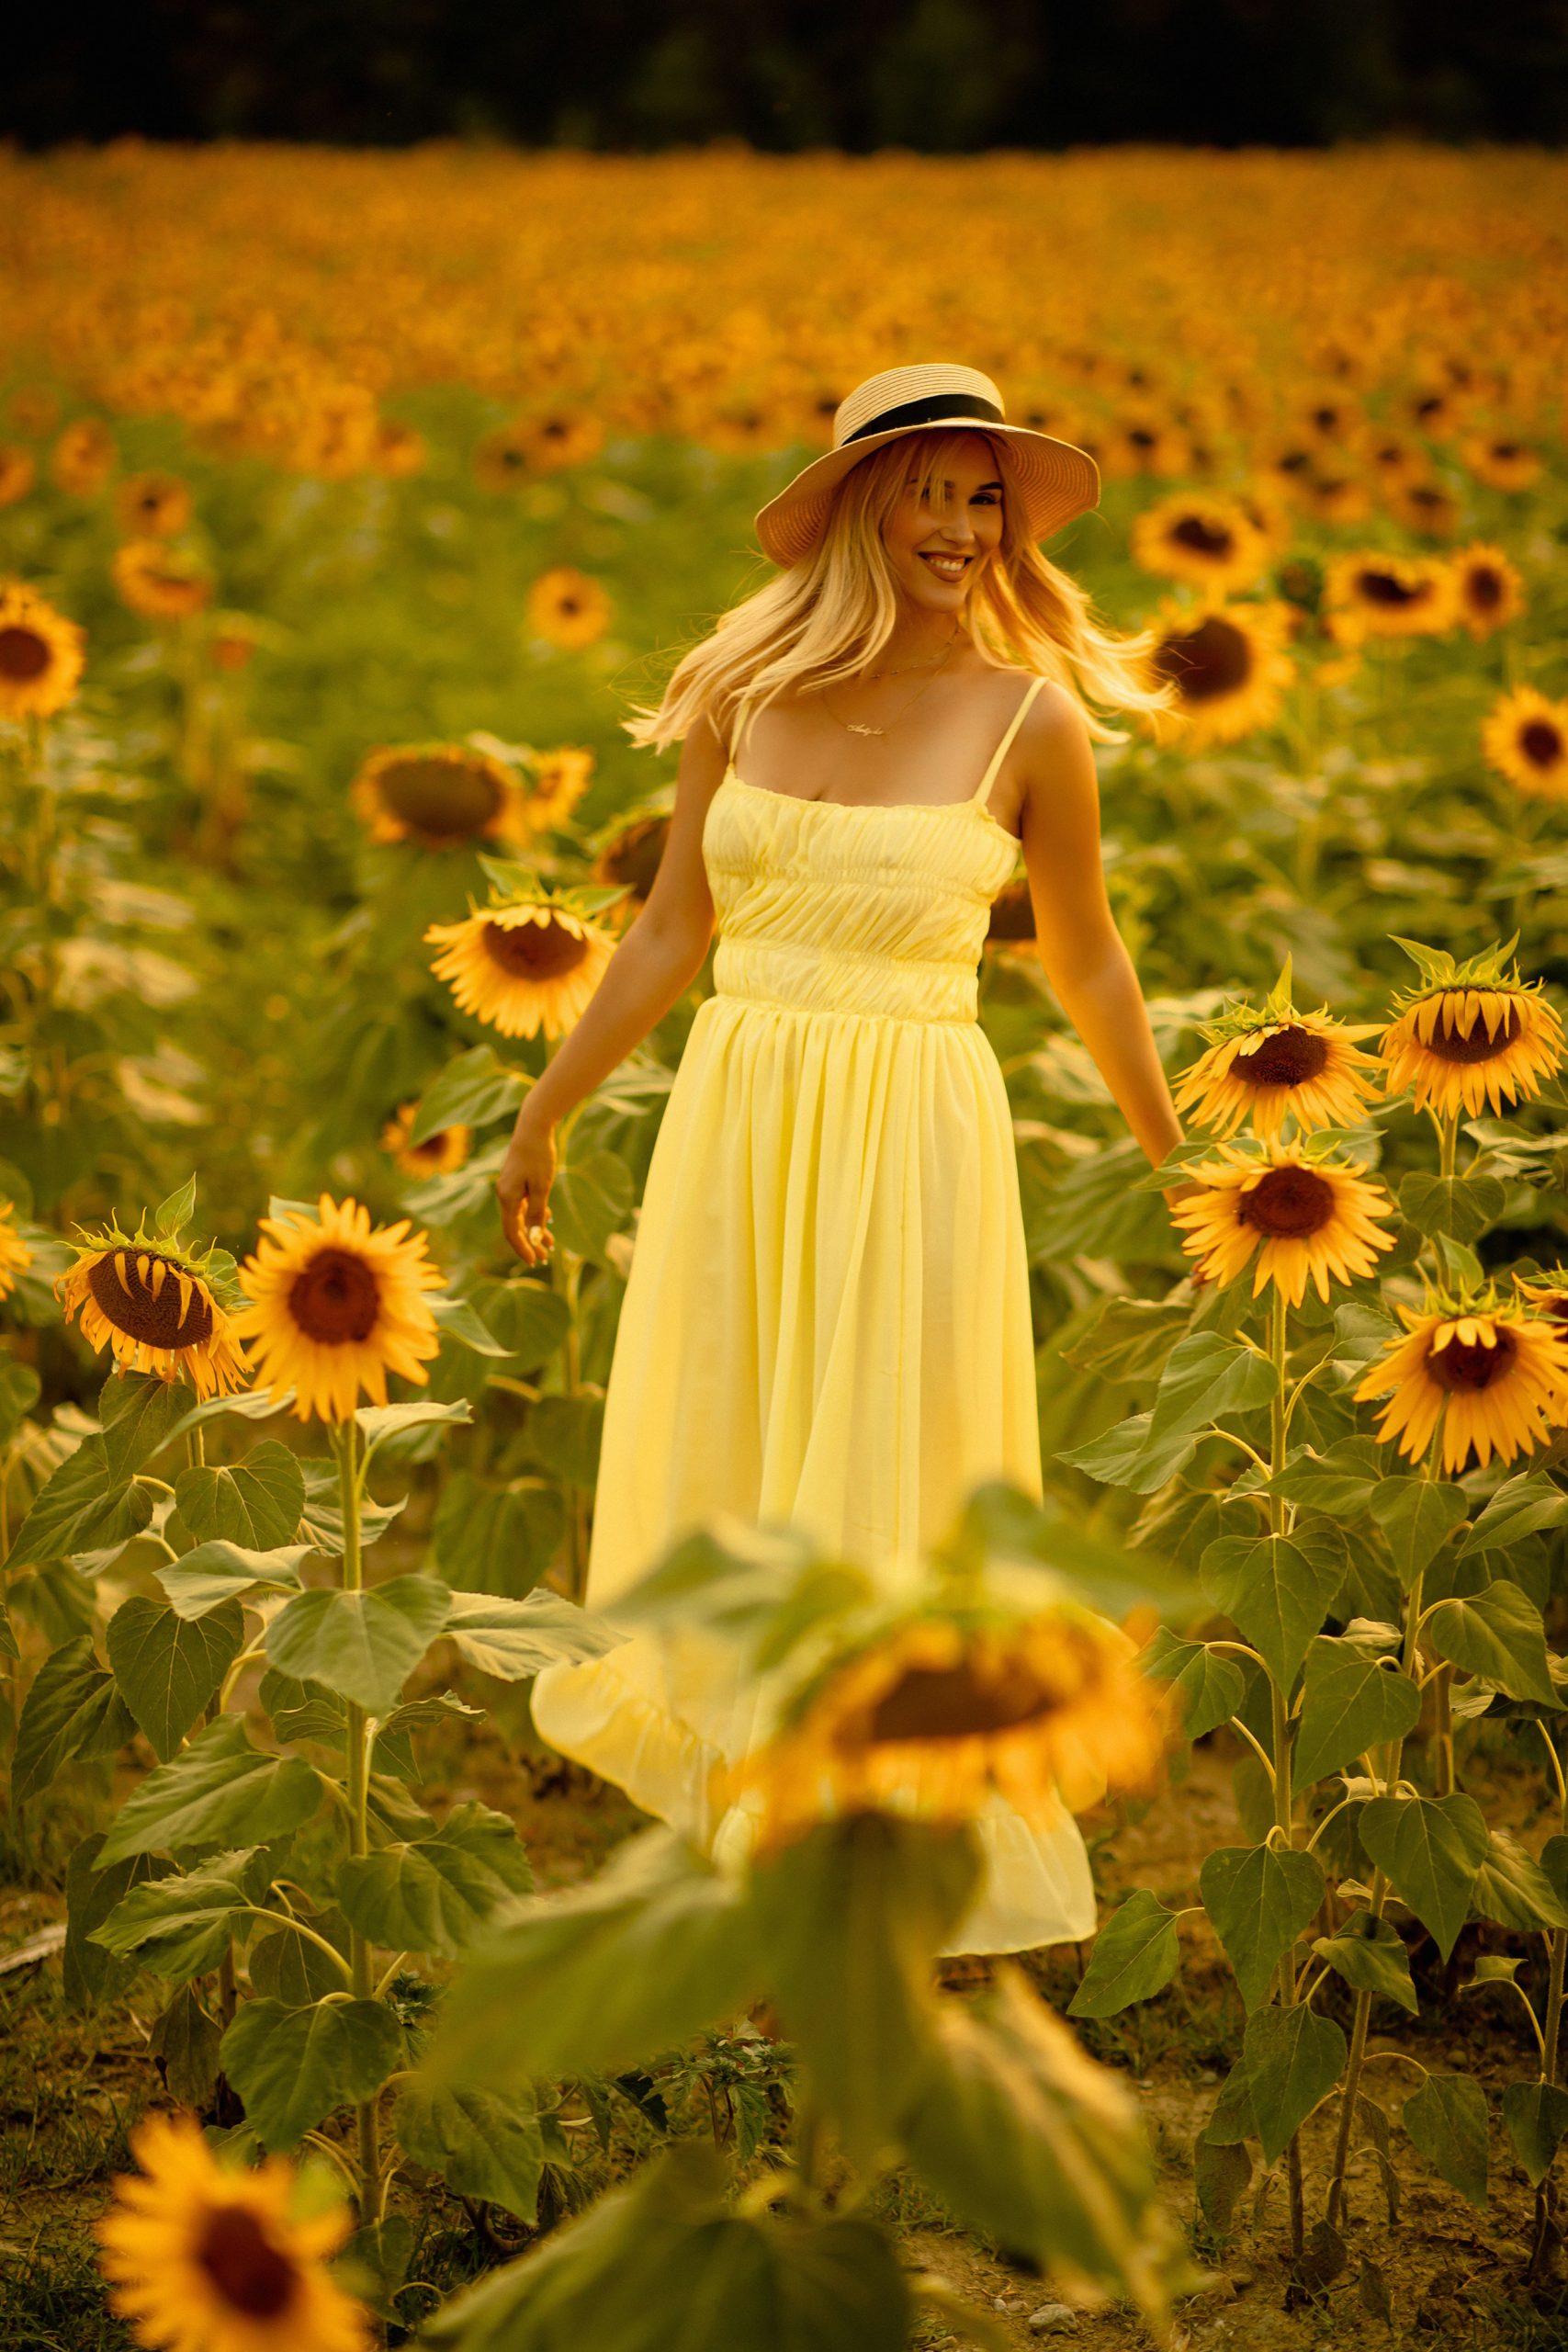 Beautiful girl twirling in nature